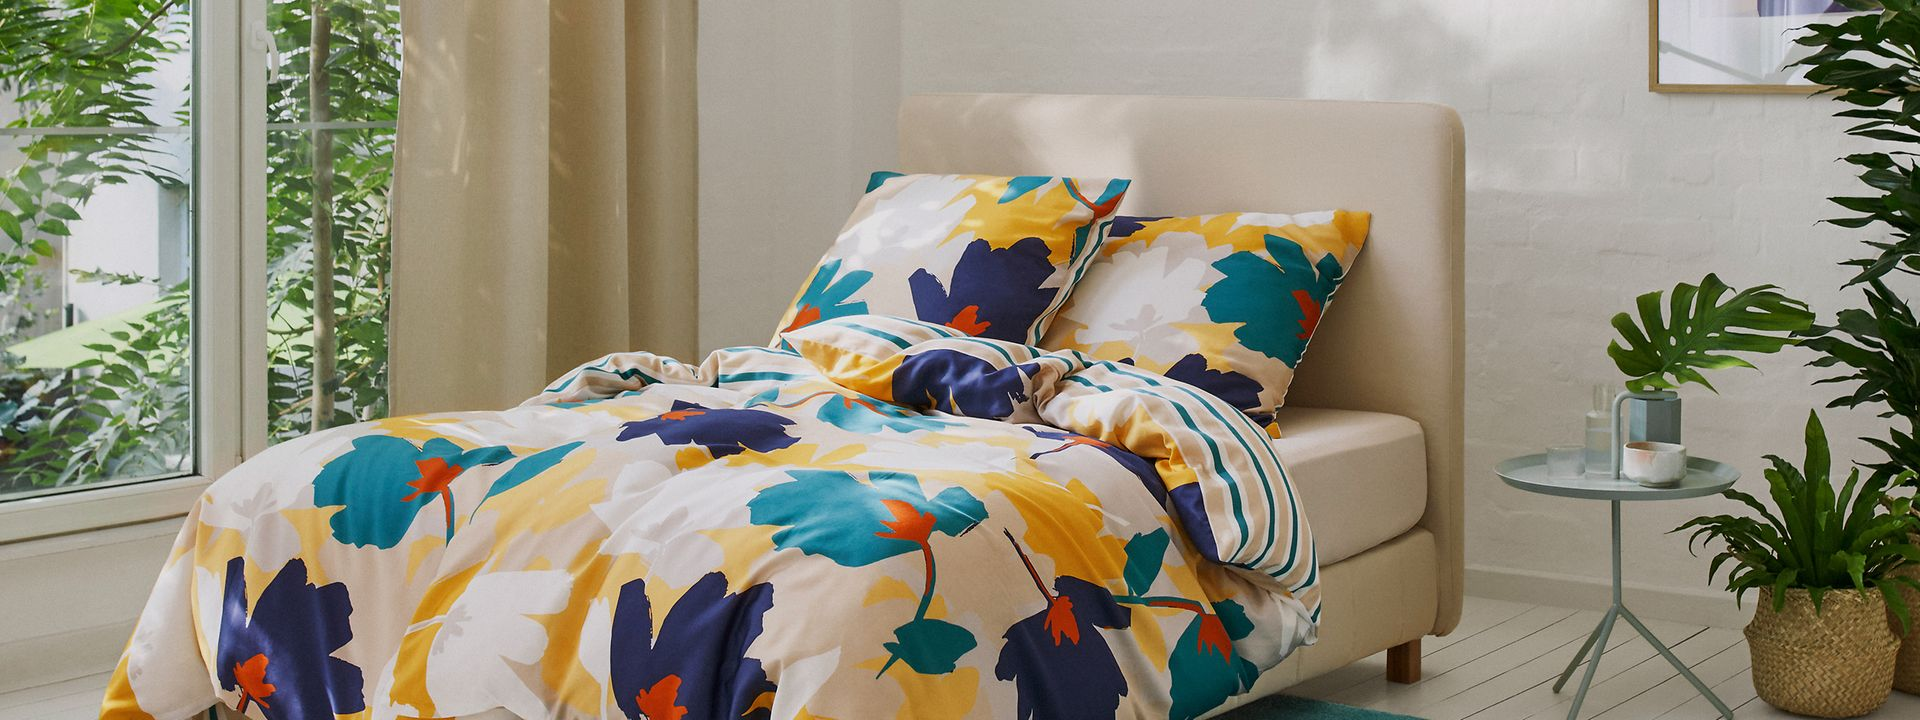 222021 - home - startpage - main banner - Bedroom - IMG